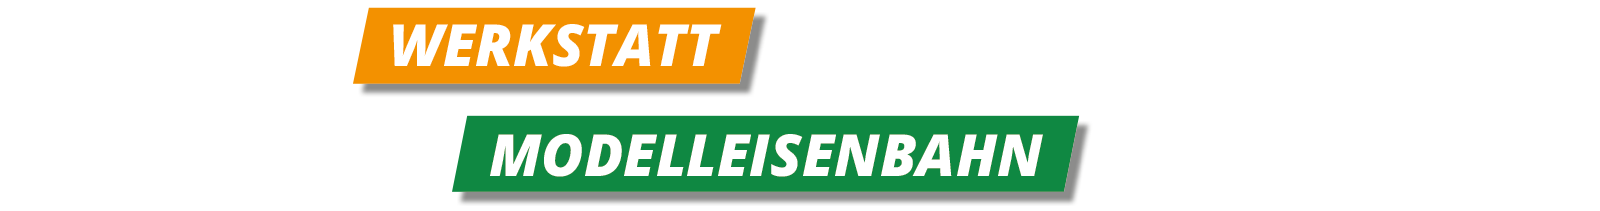 Werkstatt Modelleisenbahn